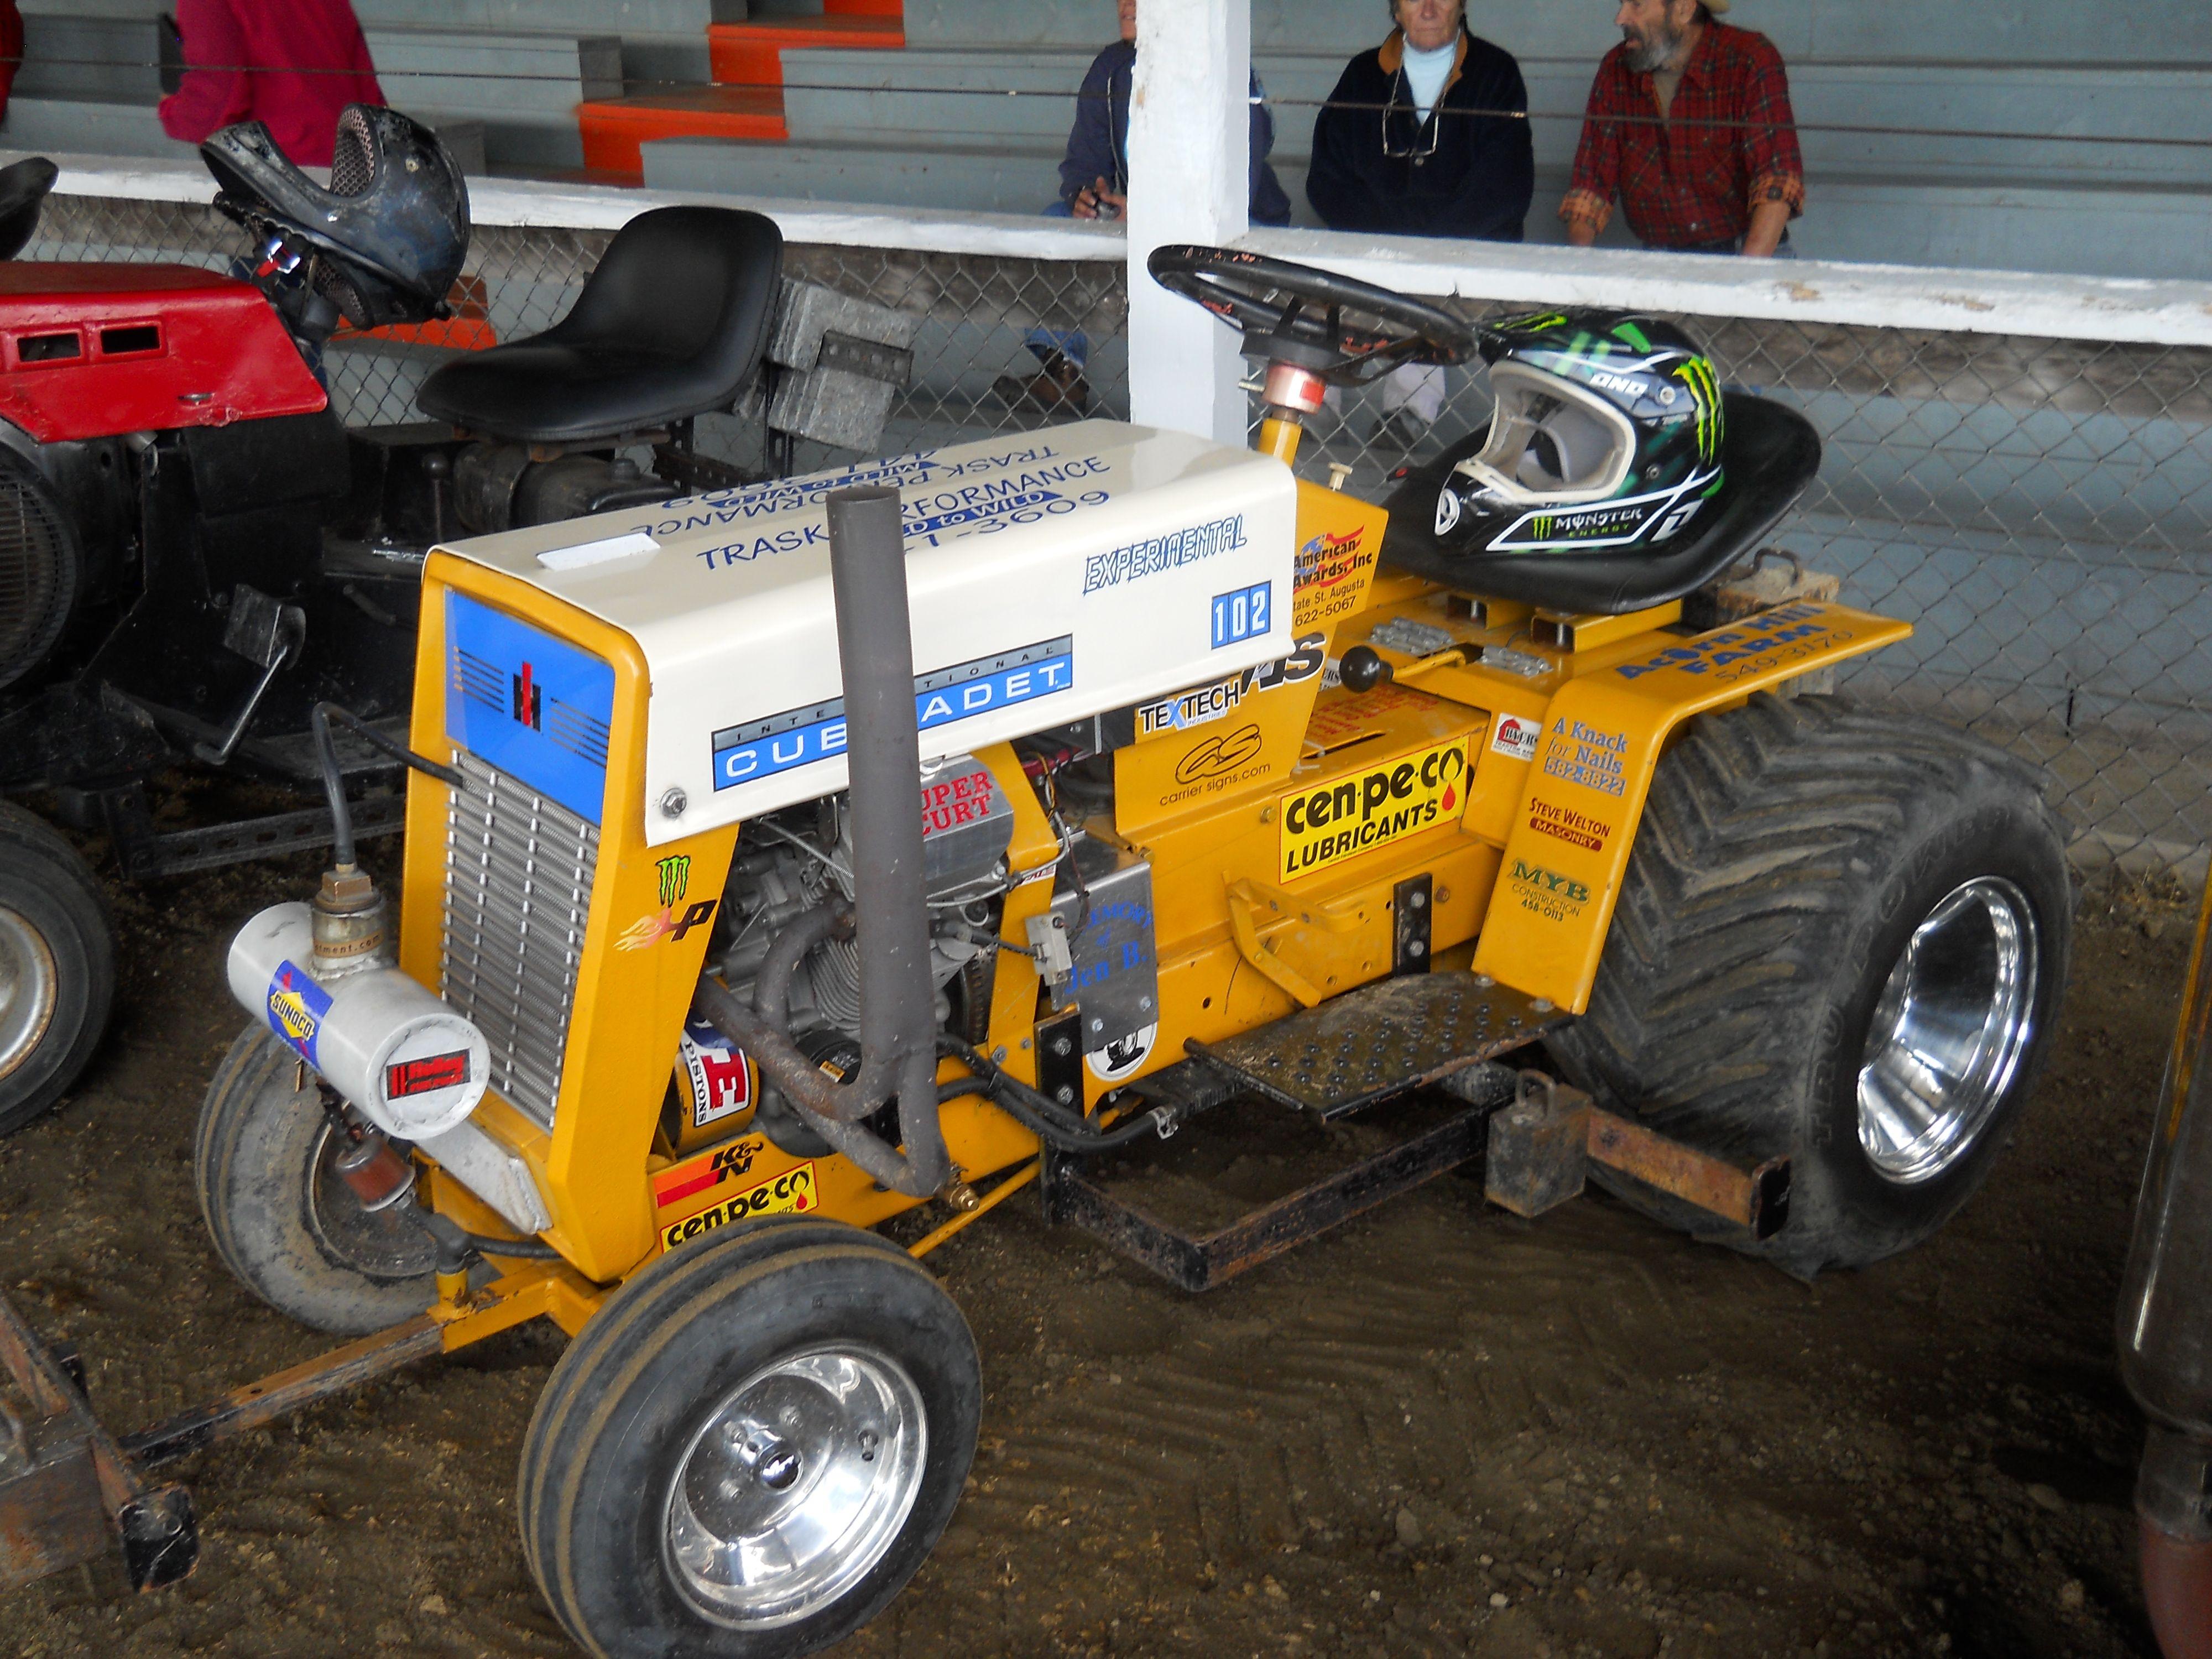 Cub Cadet Pulling Tractors : Cub cadet sponsors in the lawn mower pull contest https